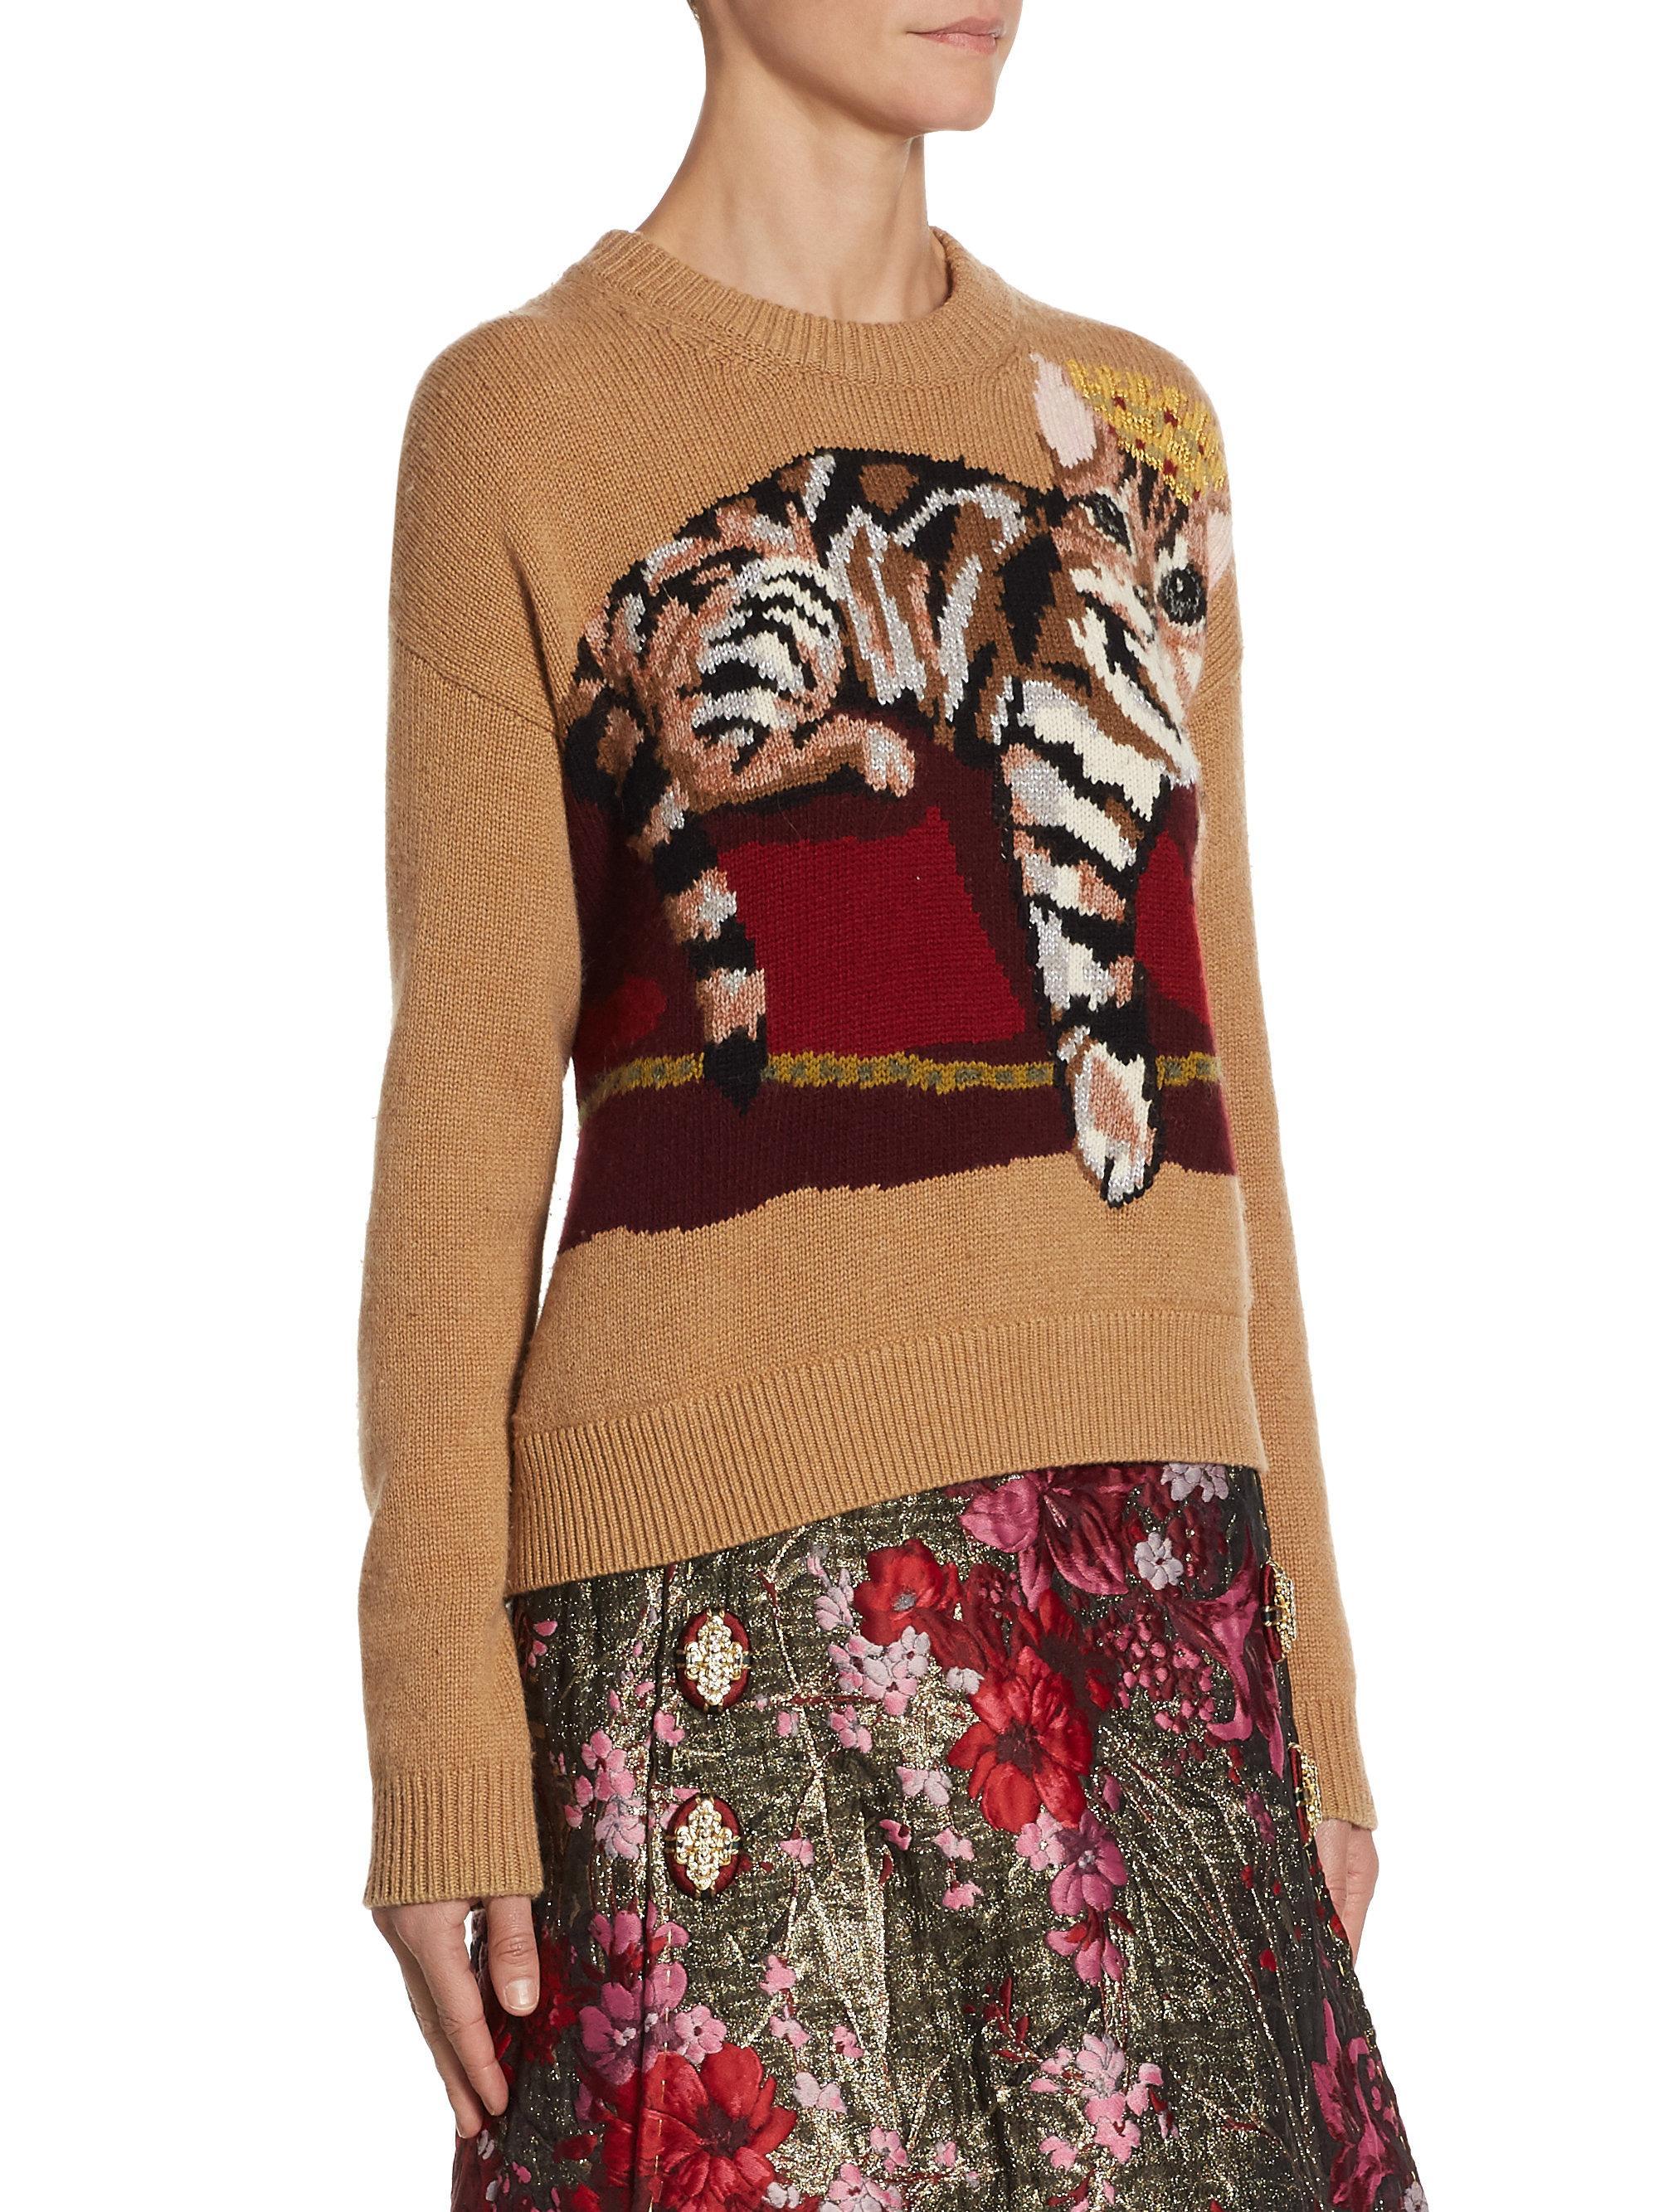 fa6a0ee5870de4 Dolce & Gabbana Intarsia Cat-print Knit Sweater - Lyst